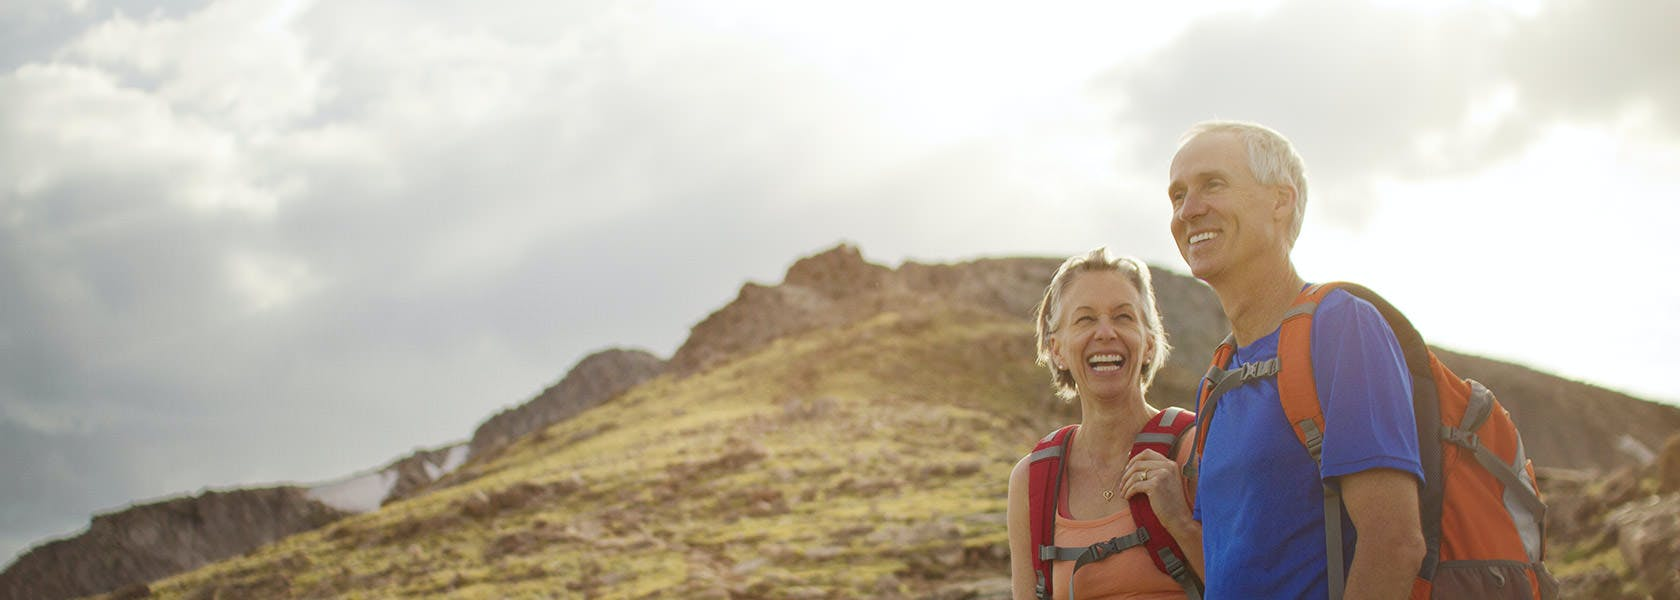 A Couple Hikes Along A Mountain Trail